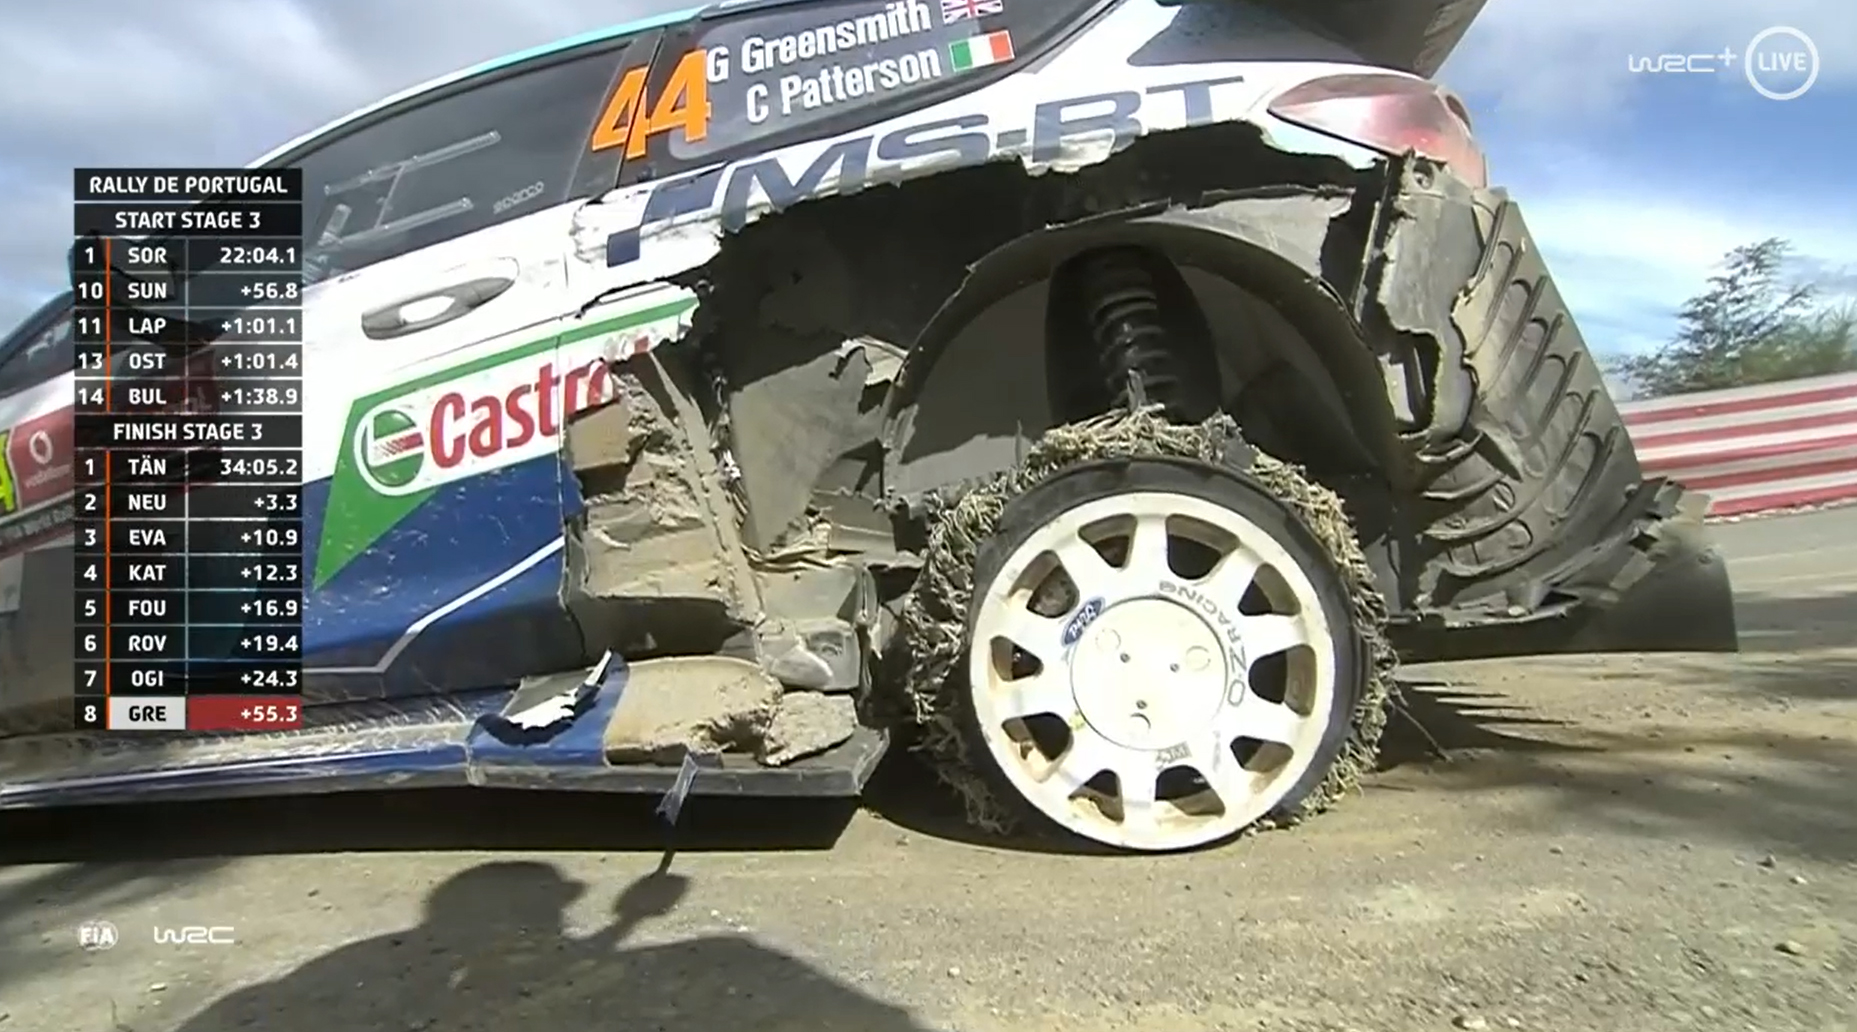 WRC: 54º Vodafone Rallye de Portugal [20-23 de Mayo] - Página 3 E15wlYhXsAEs-4z?format=jpg&name=large